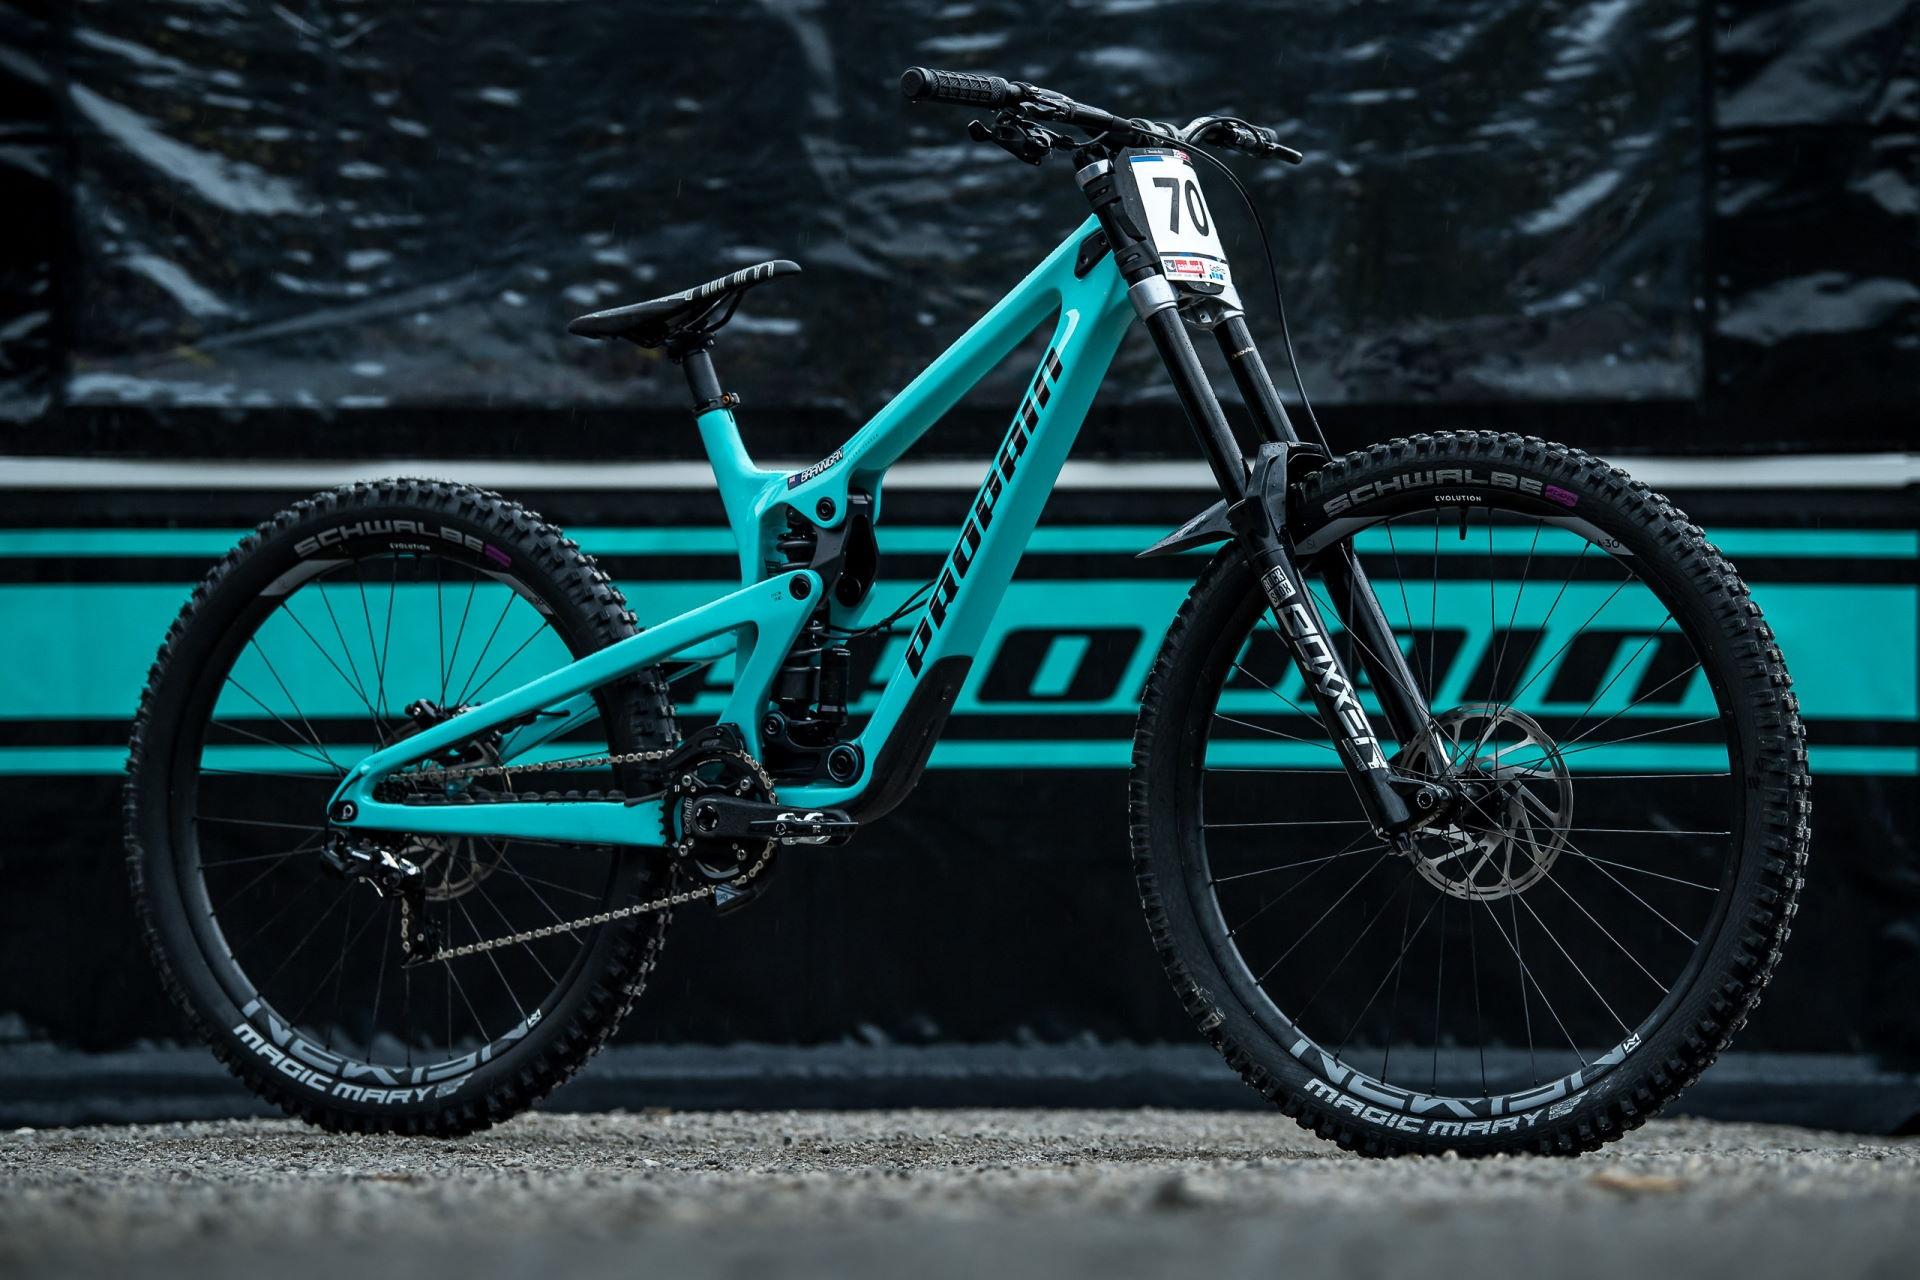 PROPAIN-Rage-CF-MY2021-Leogang-WC-Bike-Still-Pit-462.jpg